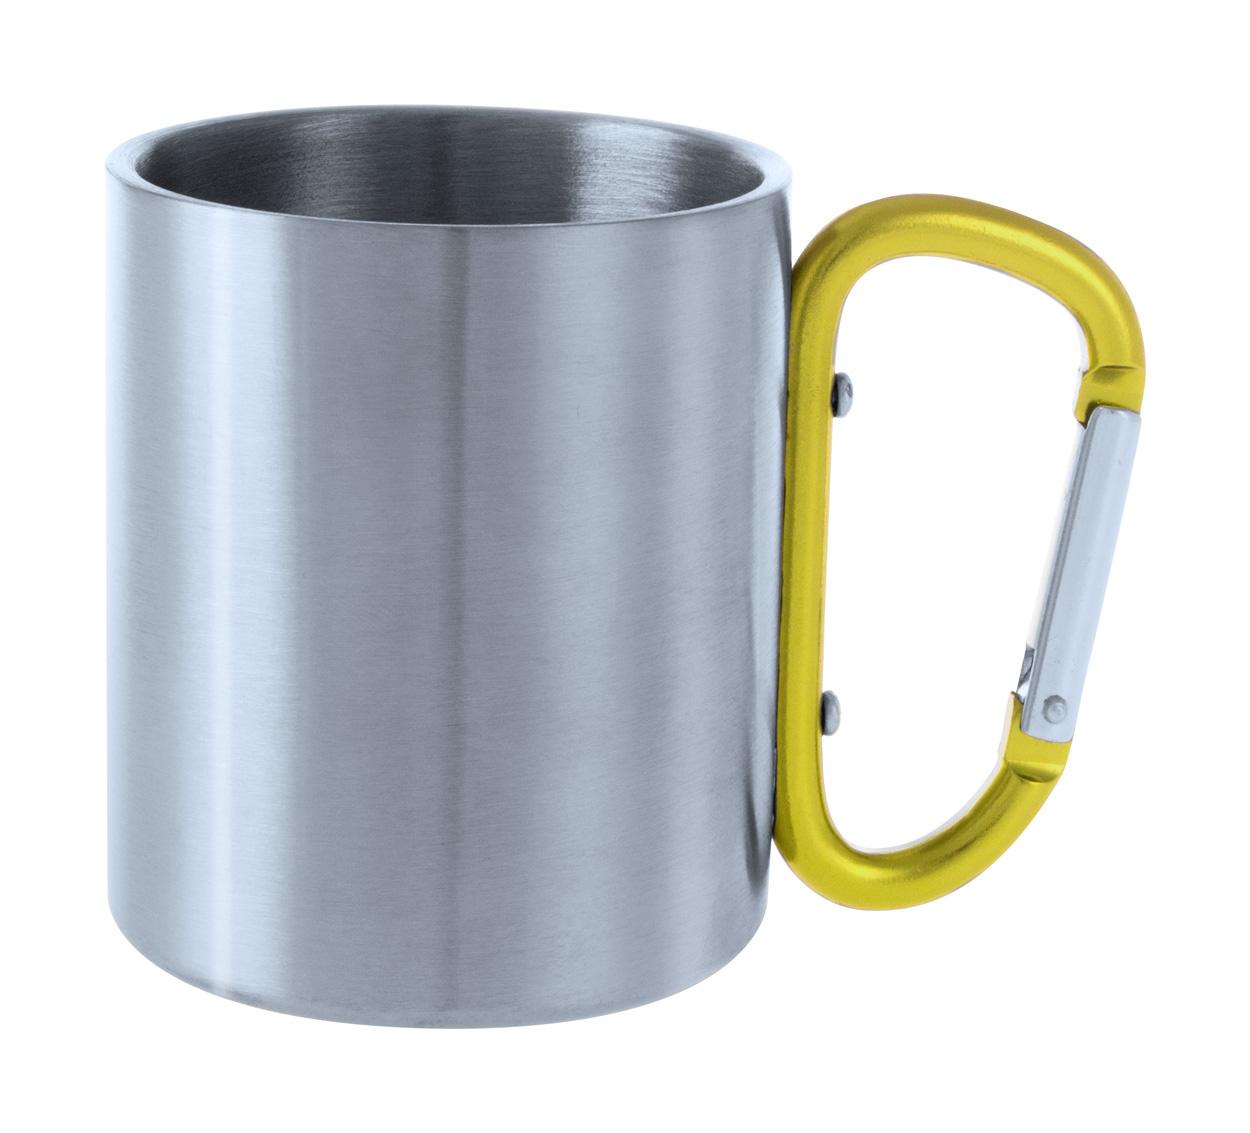 Bastic mug